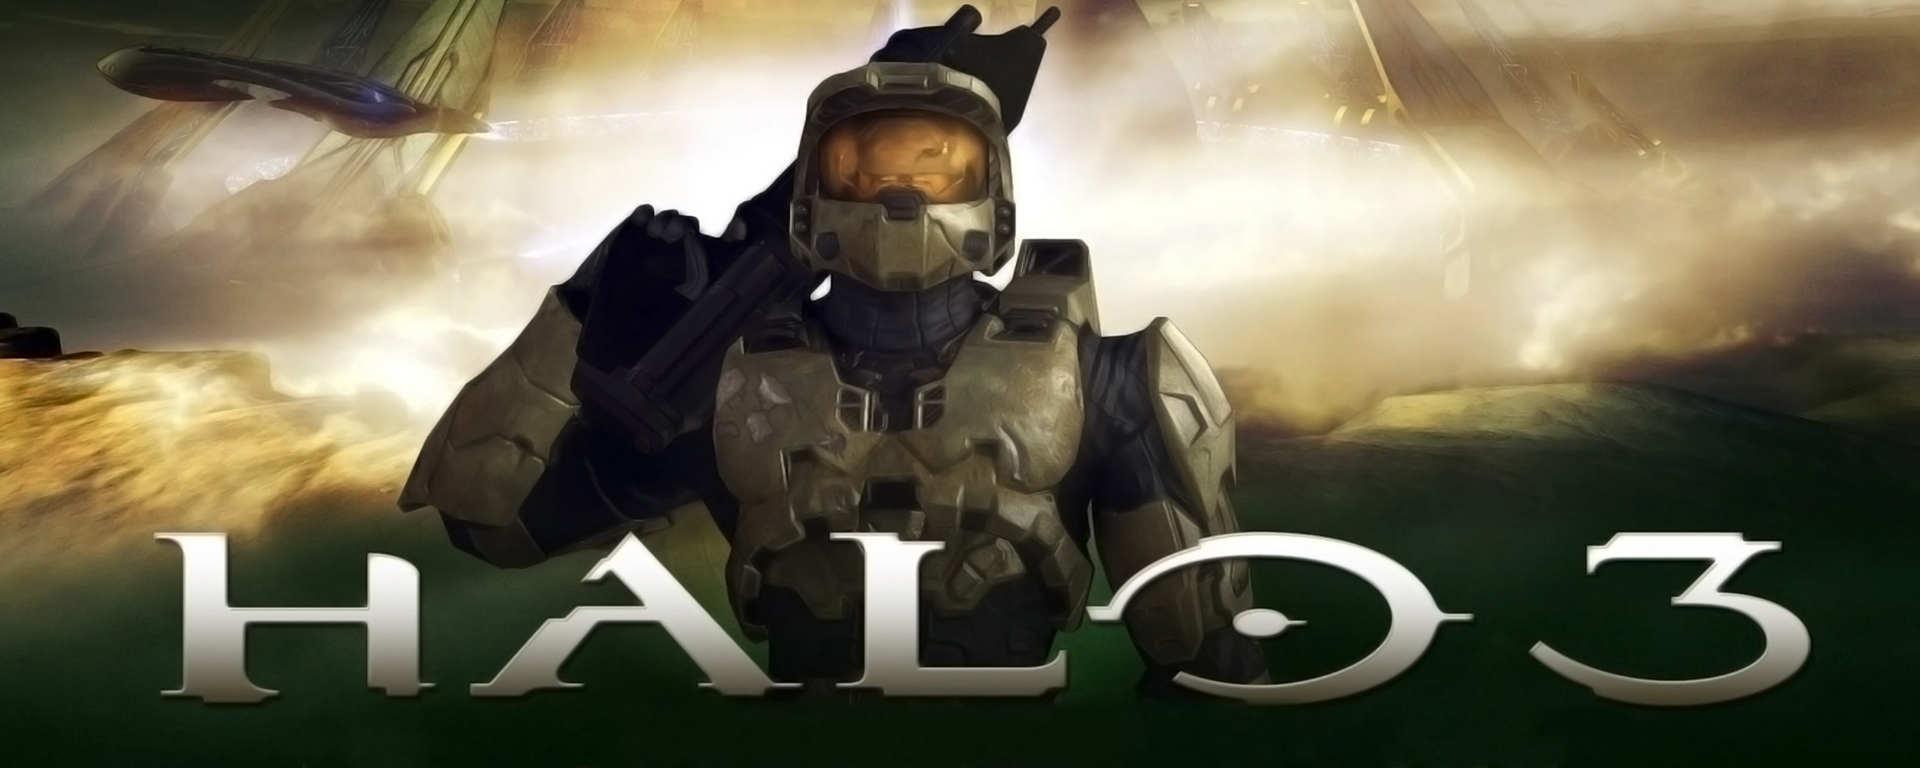 Halo 3 Videojuegos Meristation